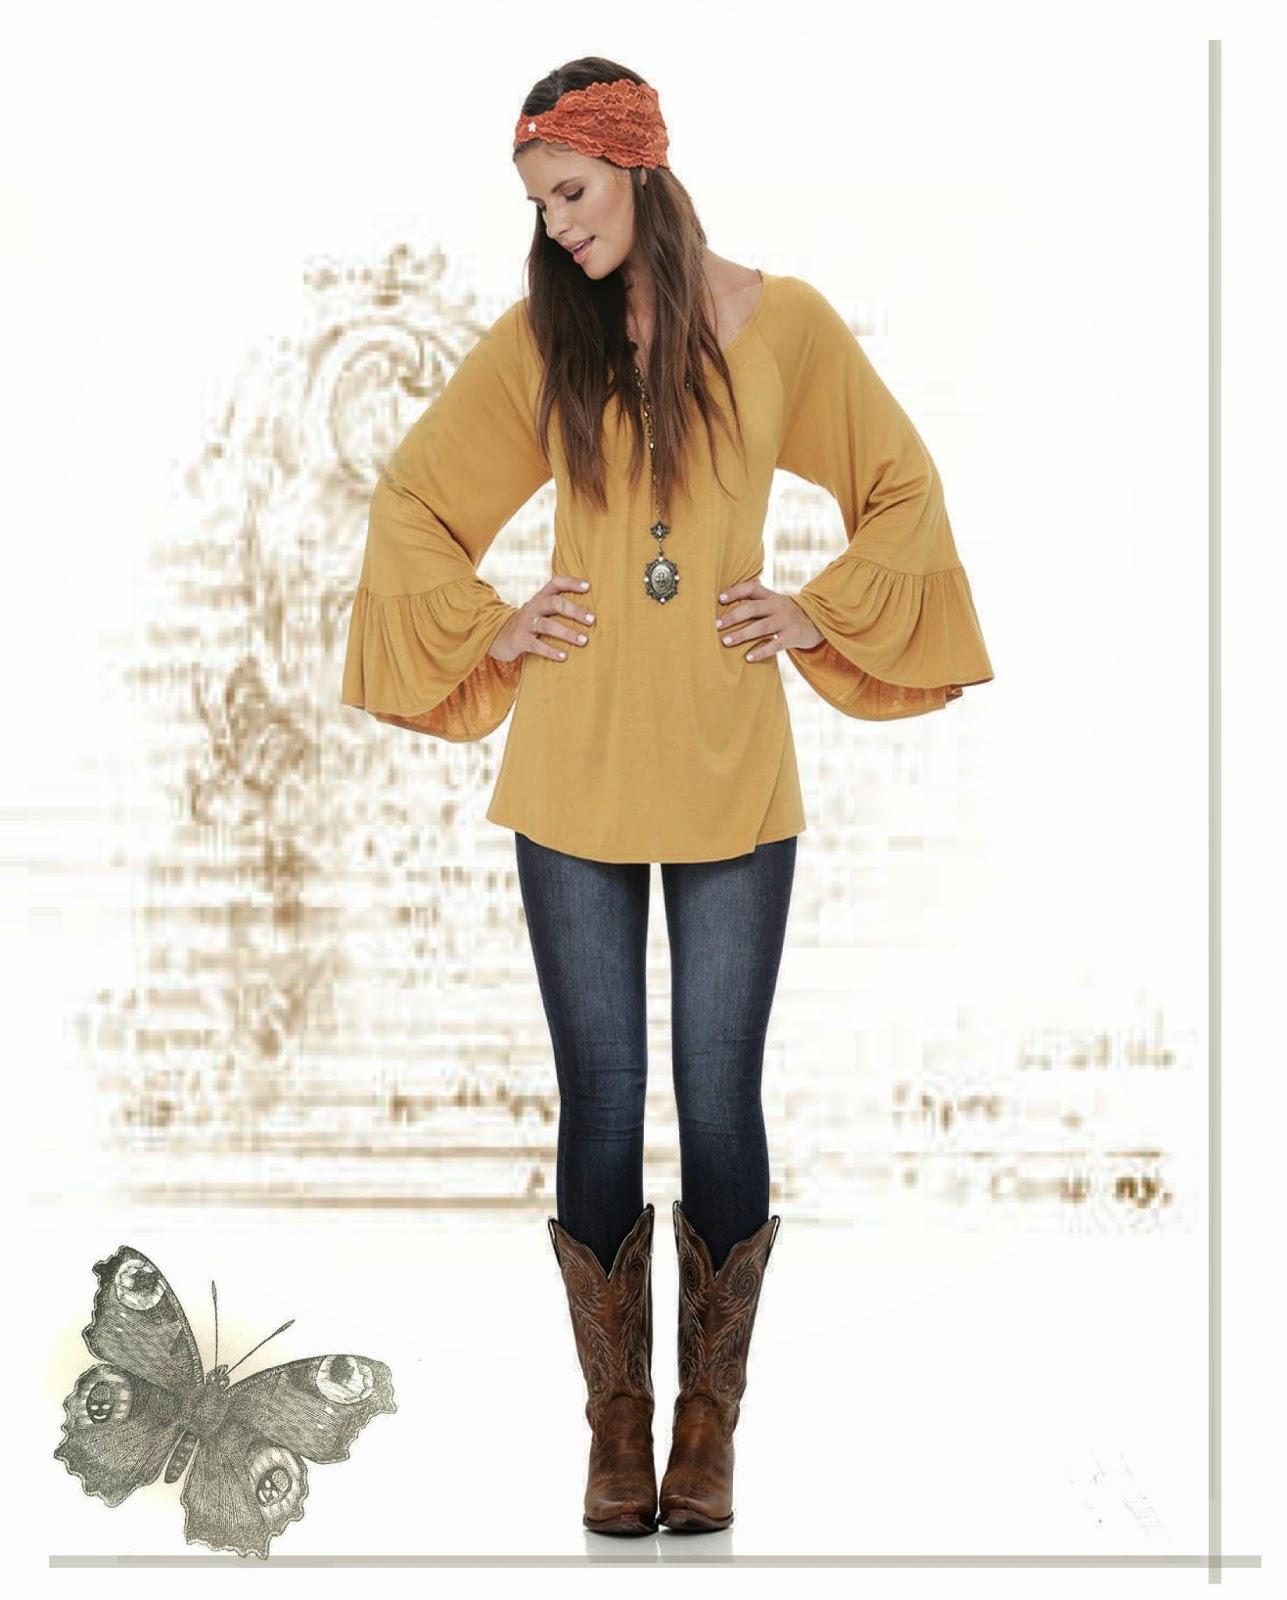 nos elle, 2tee couture, bohemian clothing, boho looks, bohemian, boho outfit, chic outfit, outfits, clothing company,